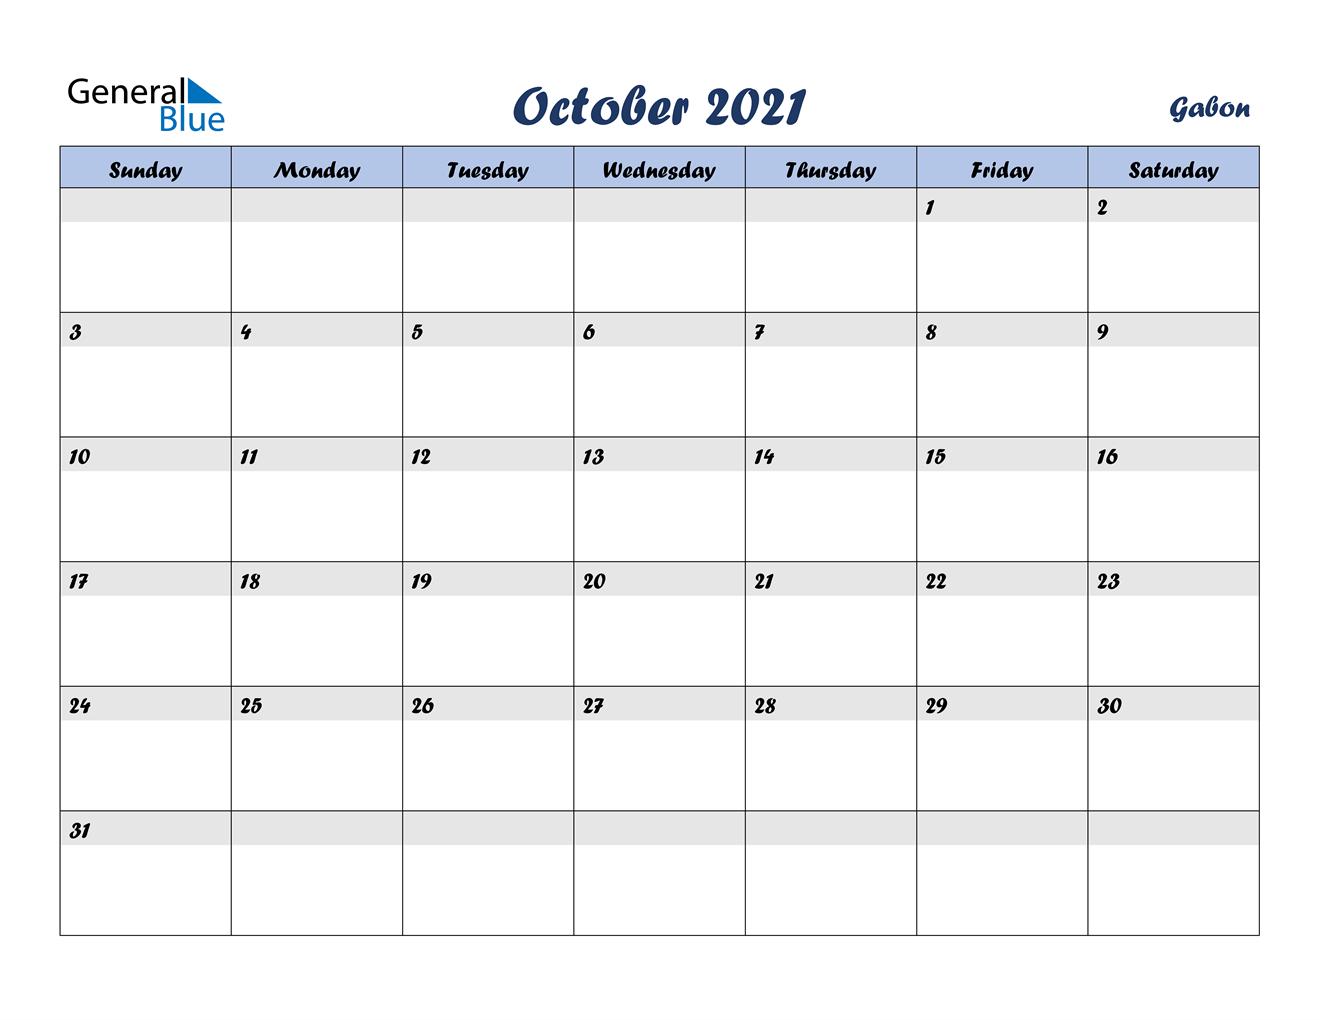 October 2021 Calendar - Gabon